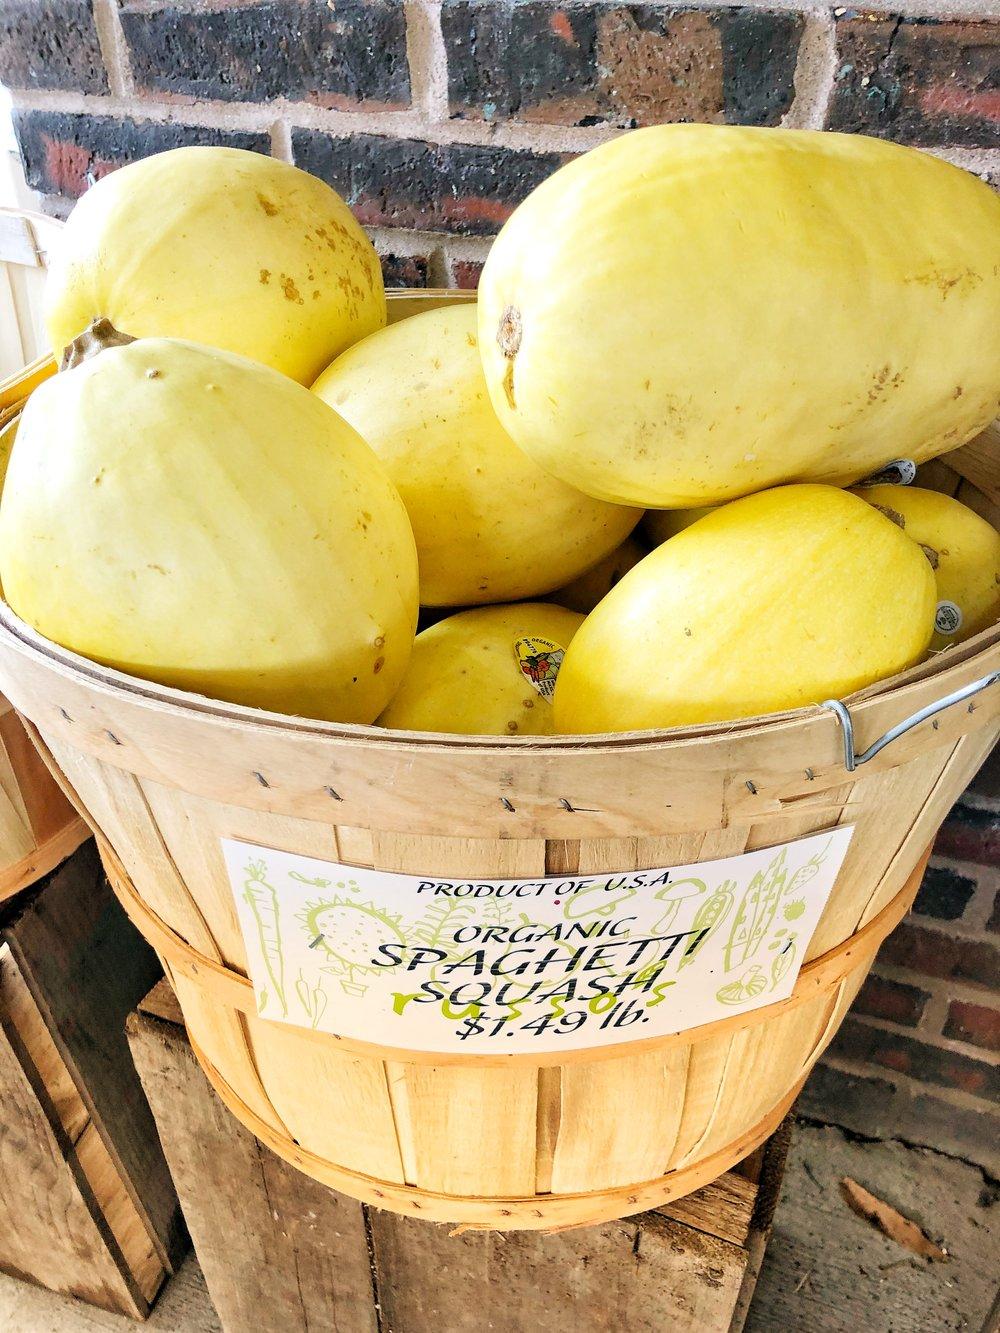 Special: Organic local winter squash $.98 lb.